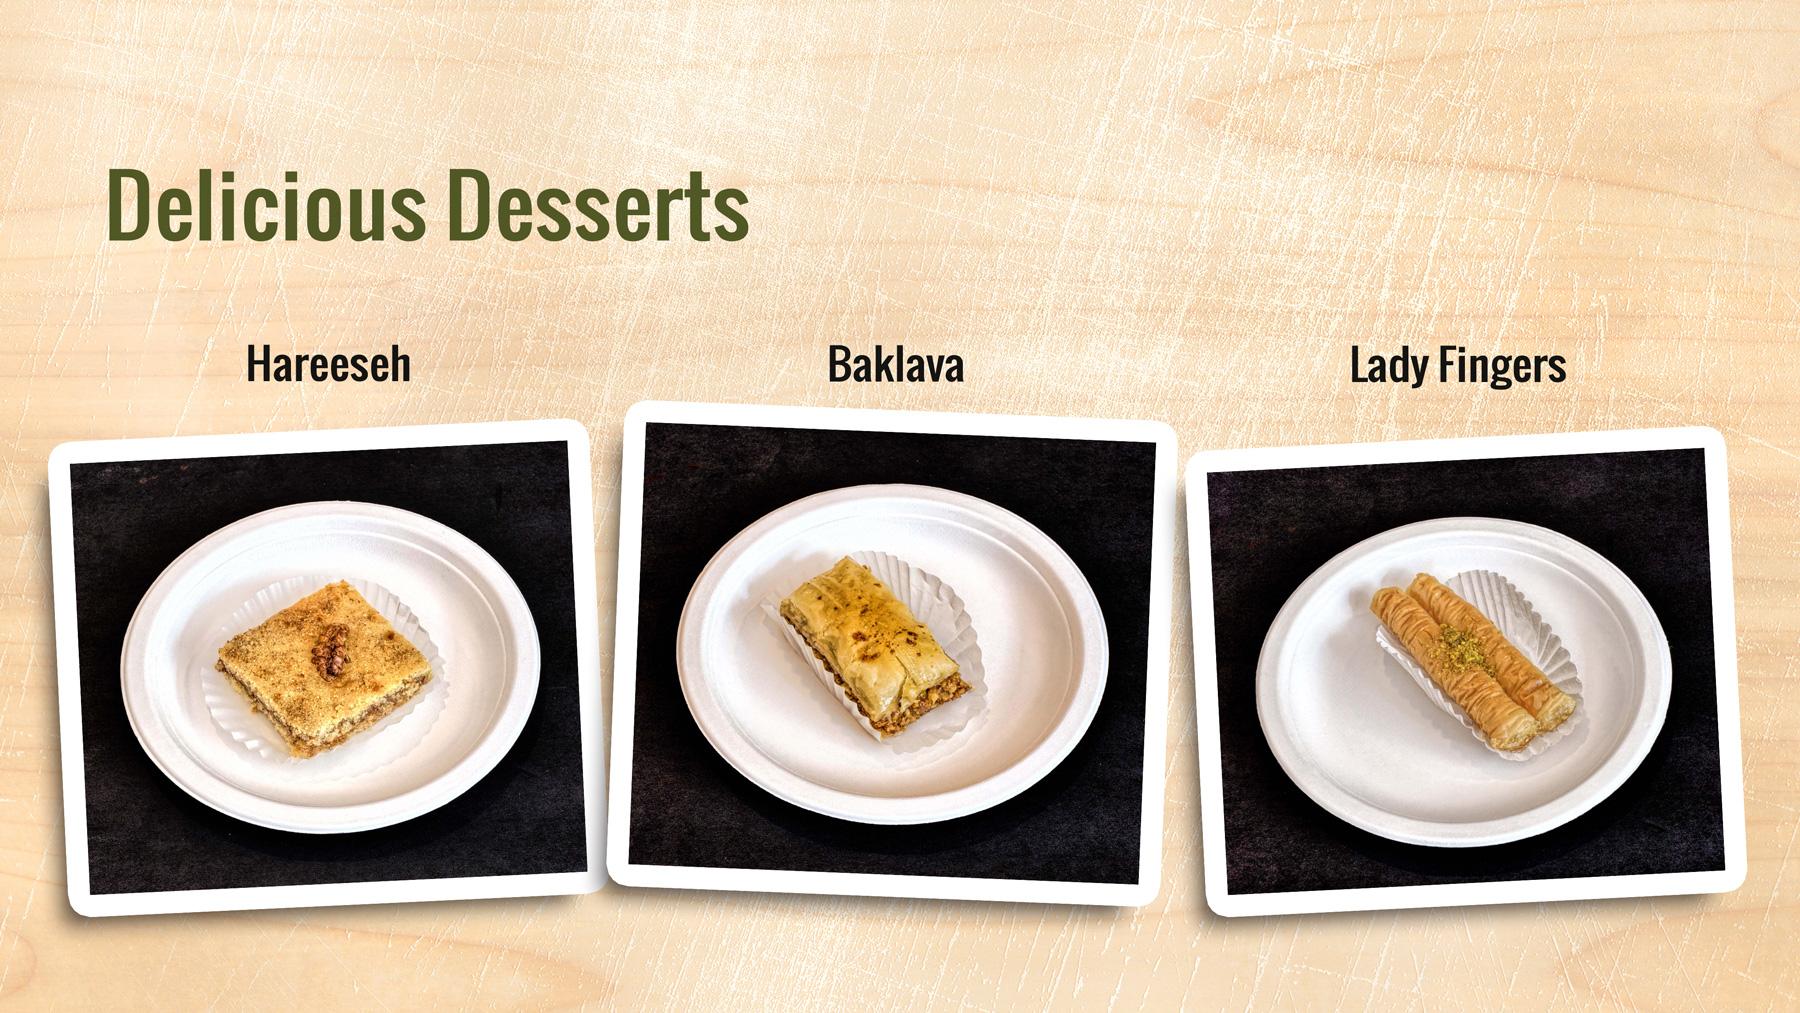 desserts_screen2web.jpg